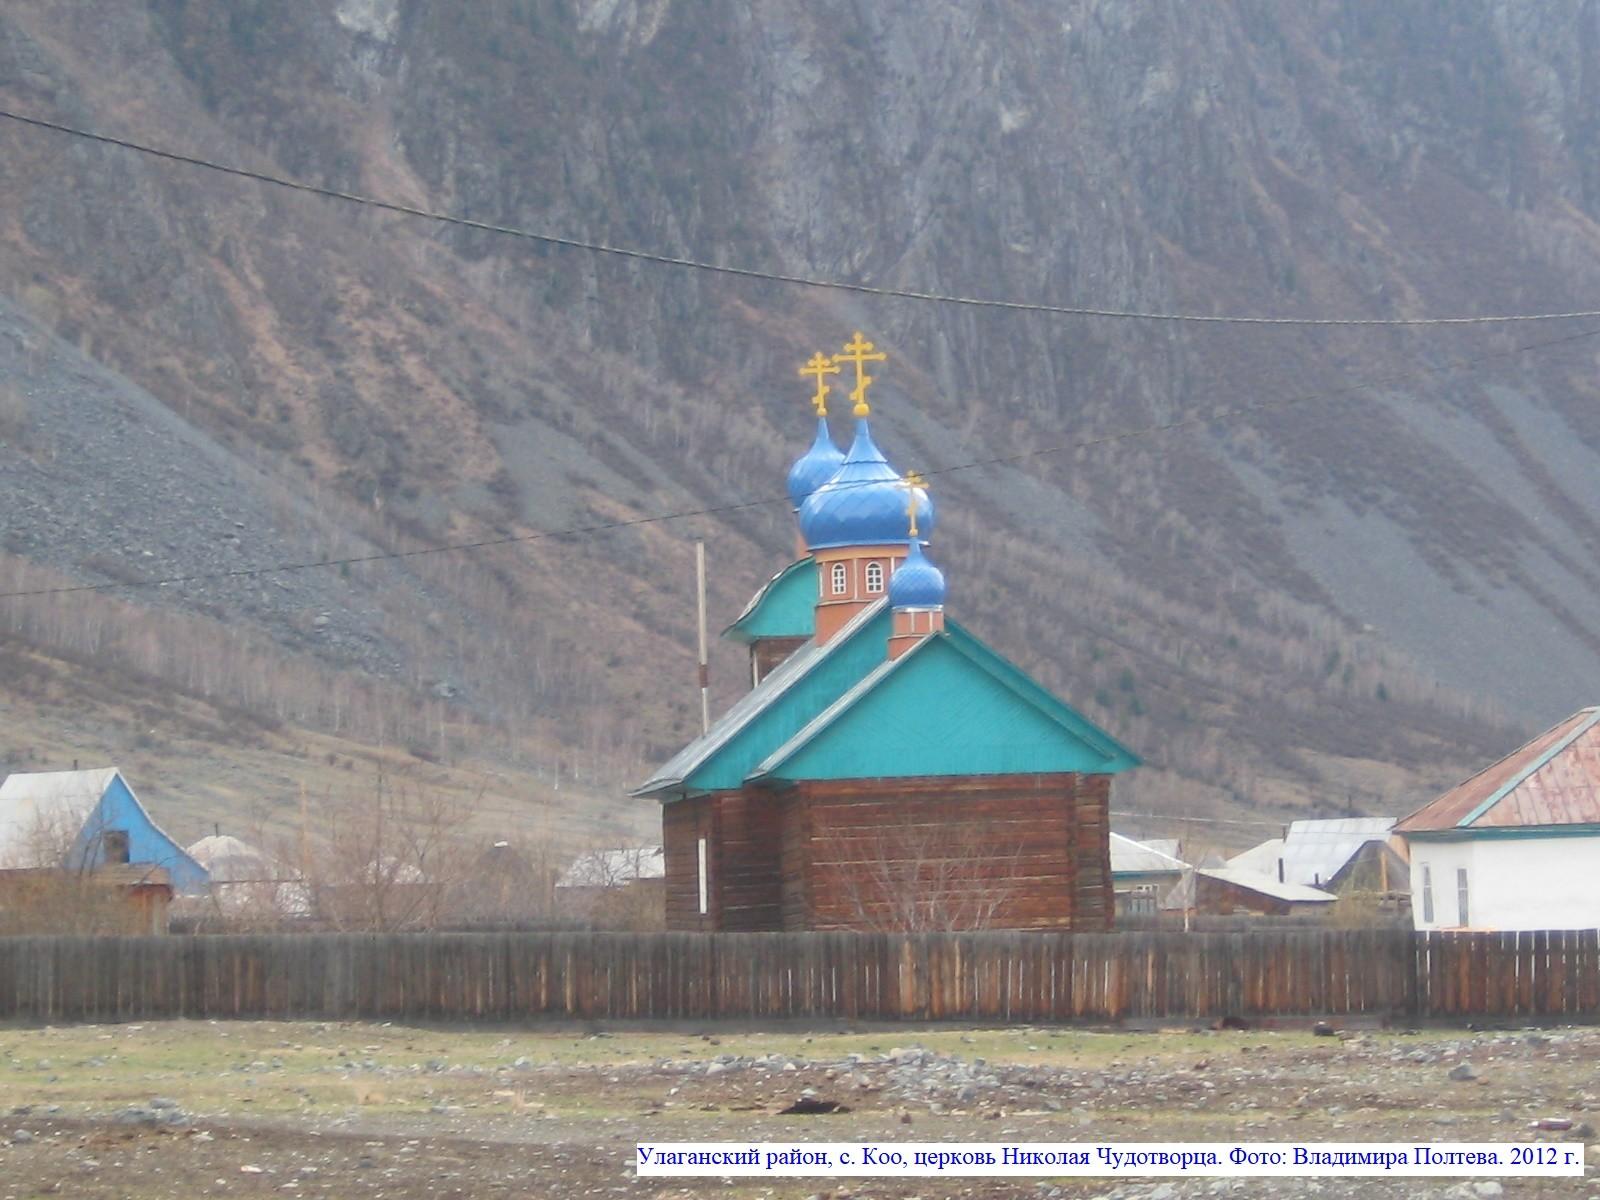 Улаганский район, с. Коо, церковь Николая Чудотворца.